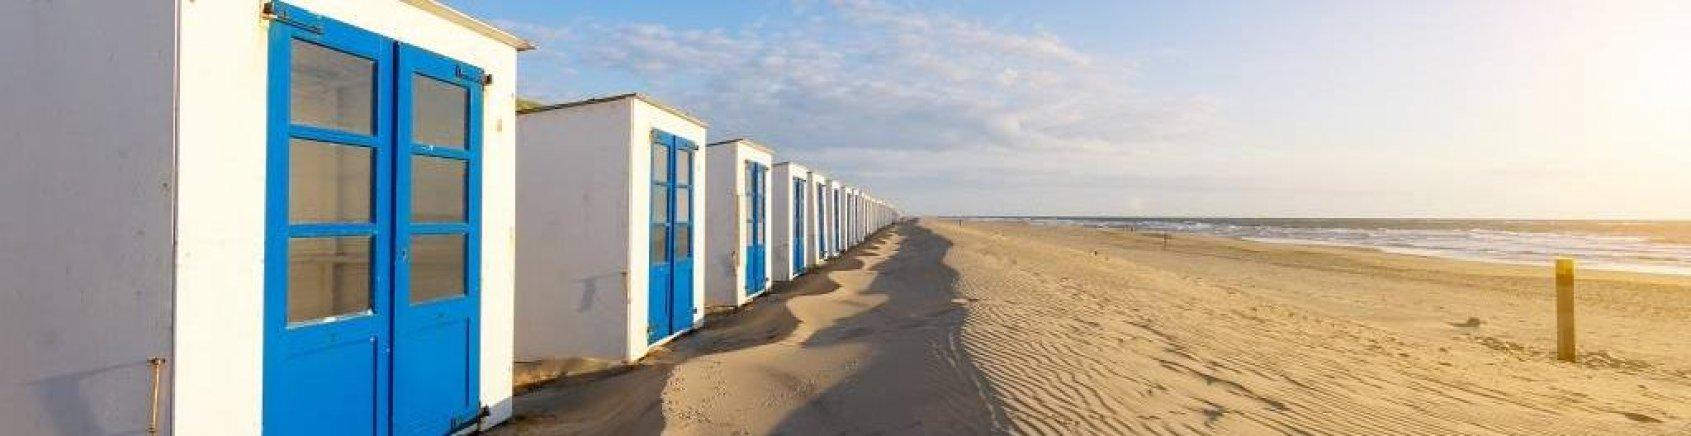 Texel Strandhuisjes